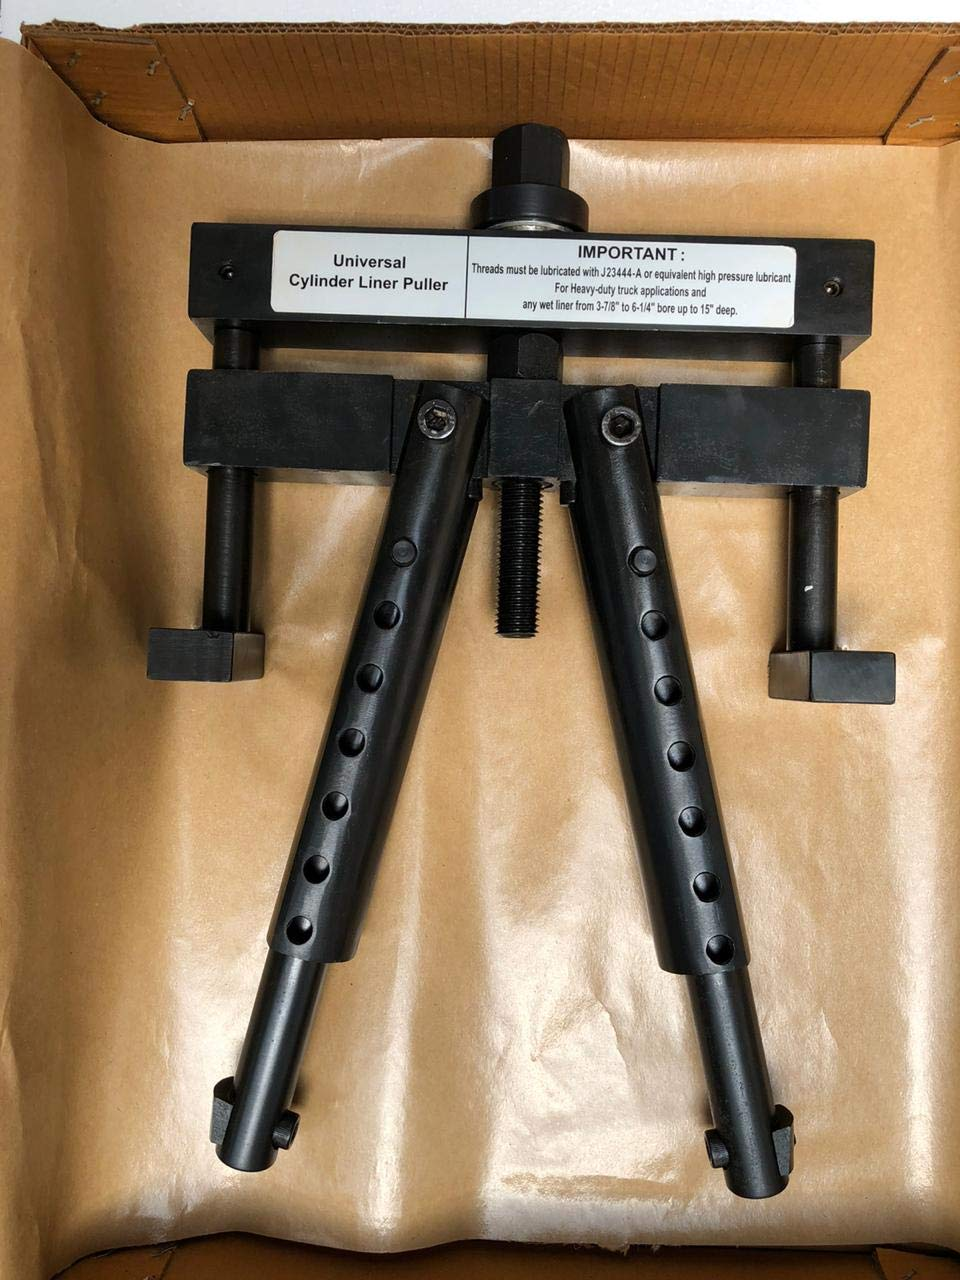 Universal Cylinder Liner Puller Assembly for Caterpillar & Cummins PT-6400-C